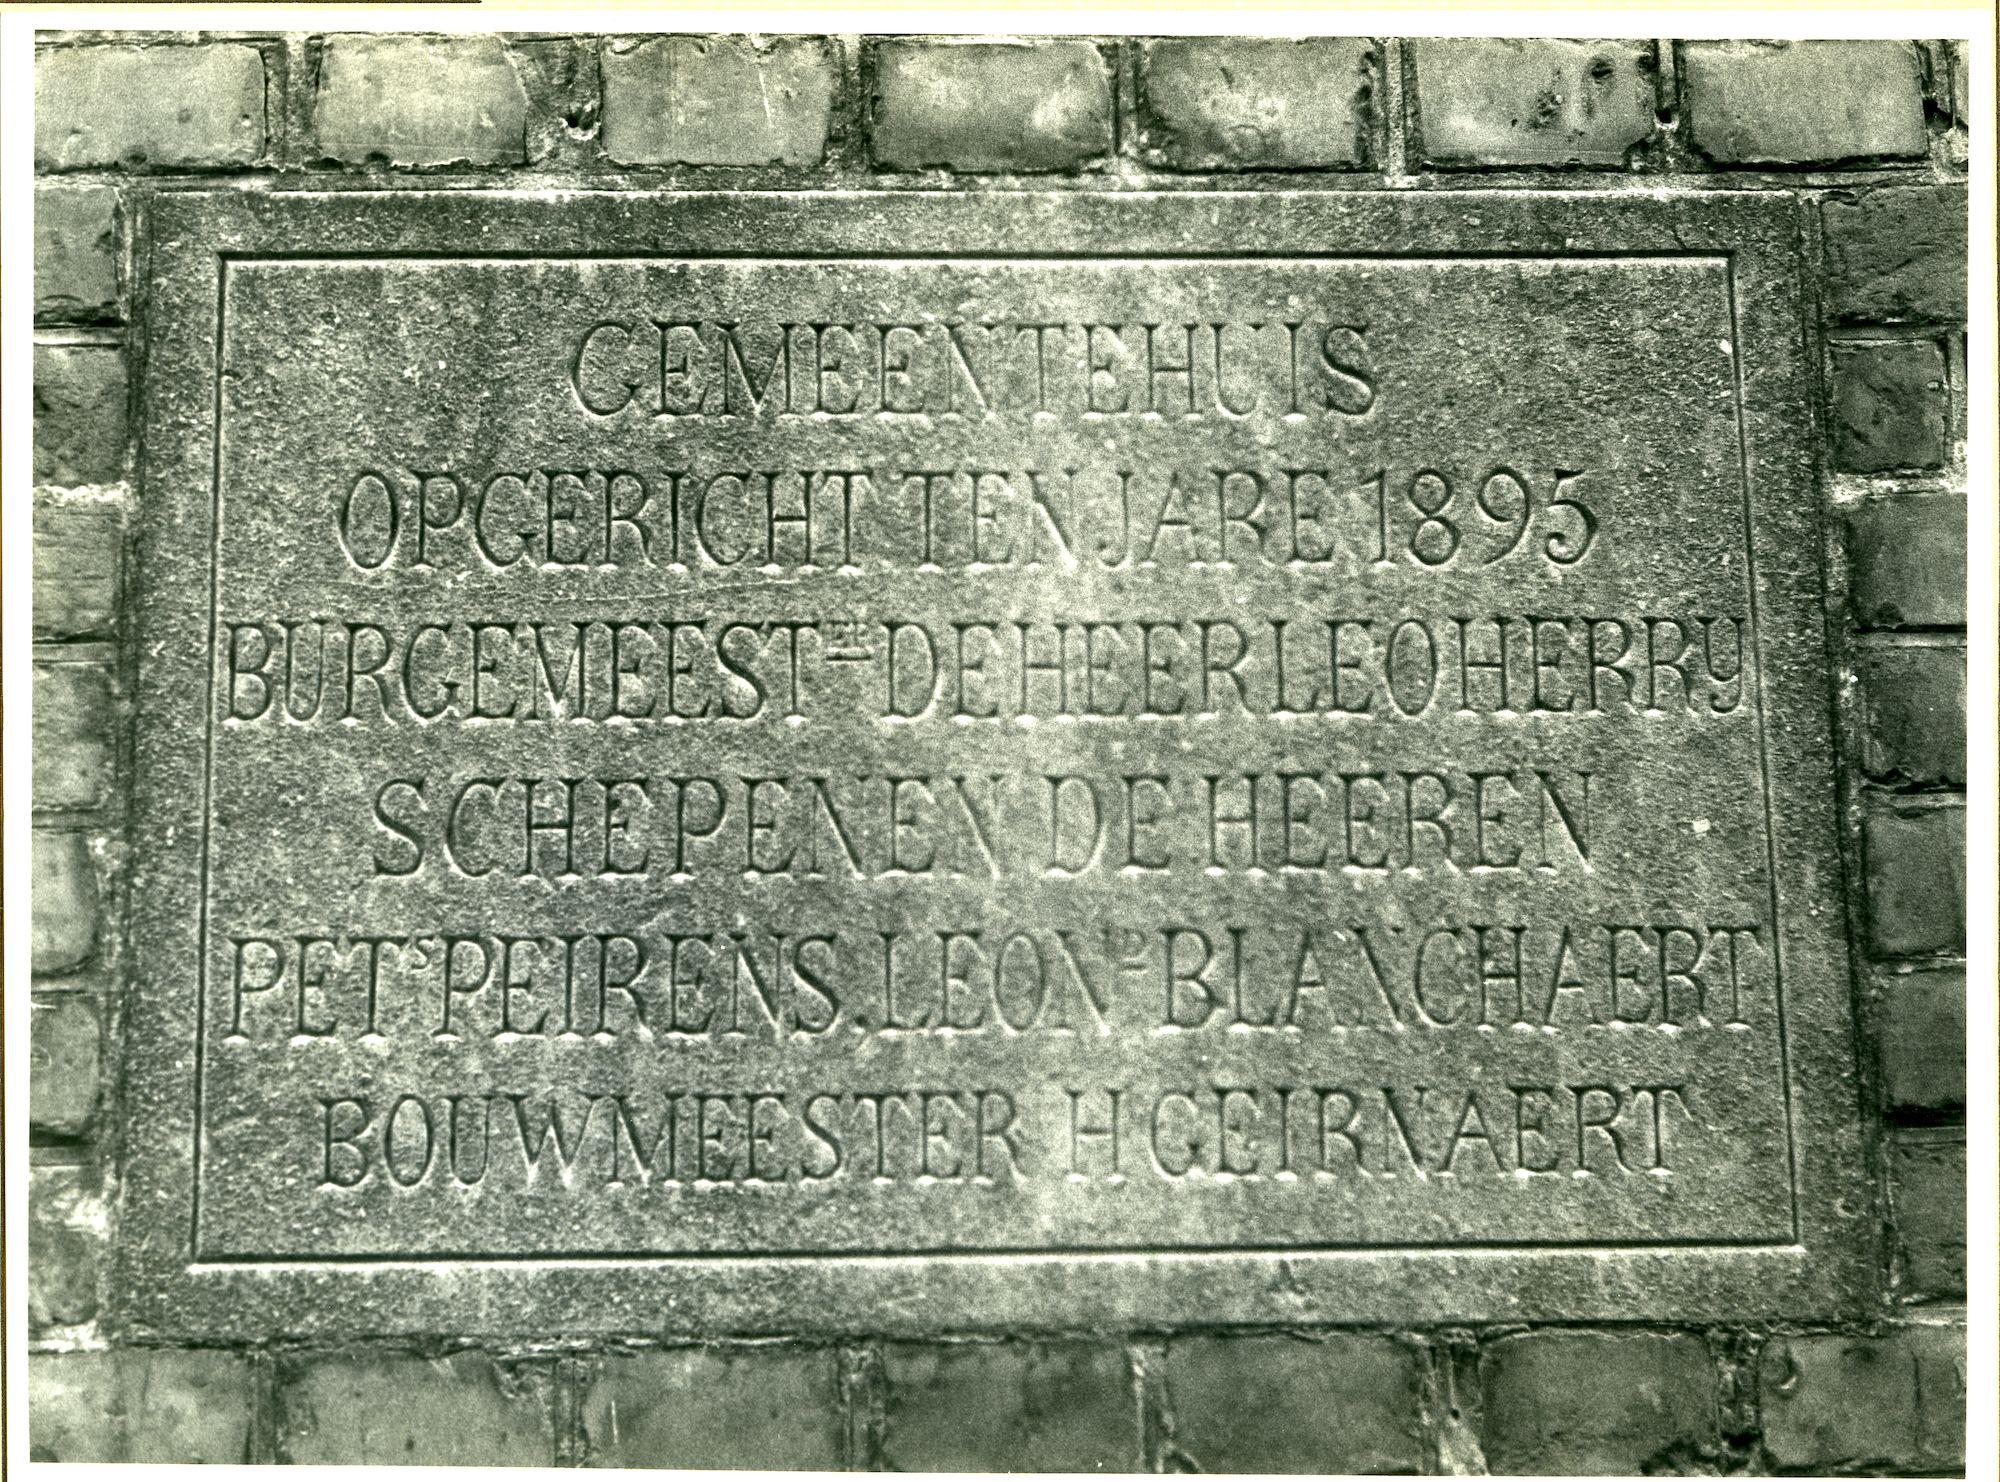 Sint-Denijs-Westrem: Gemeenteplein: Gedenksteen, 1979